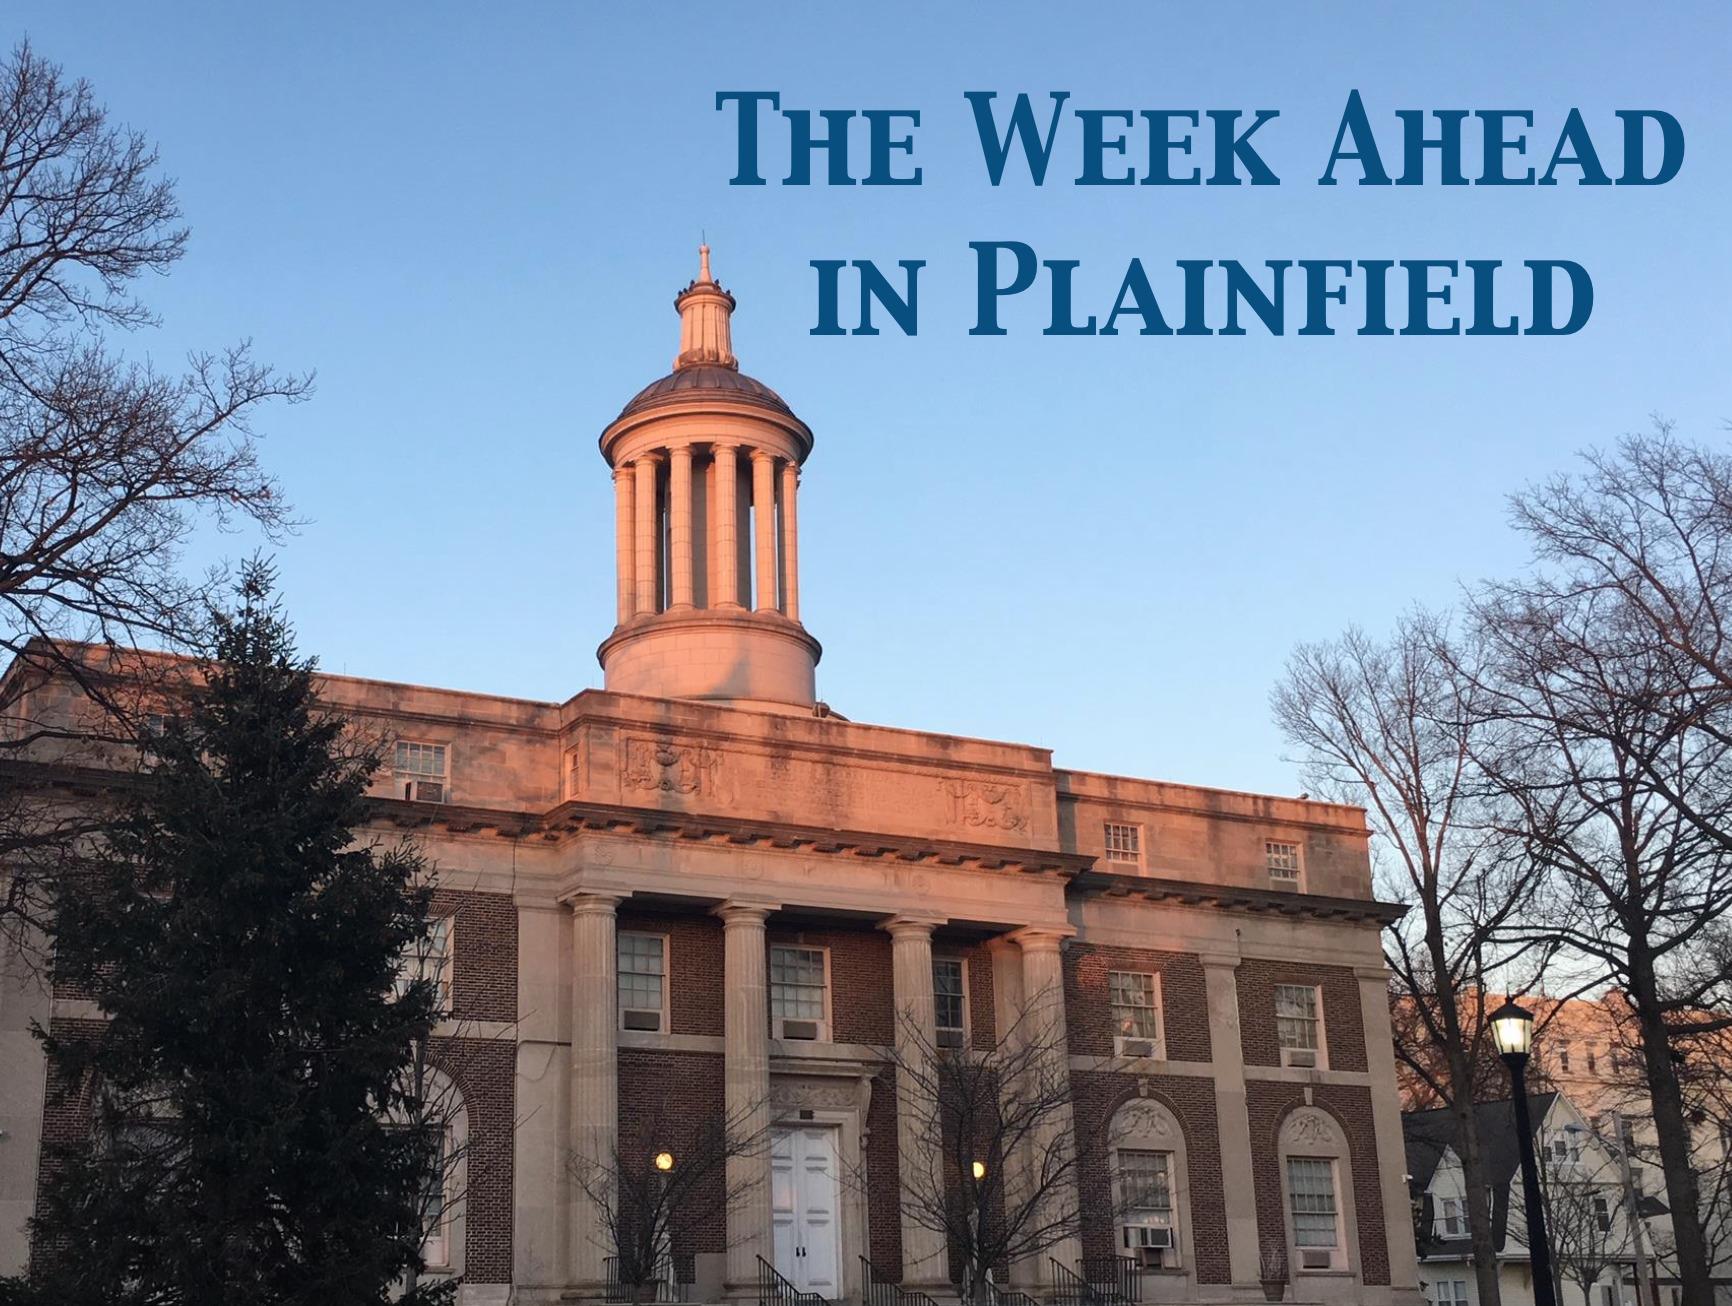 the week ahead in plainfield.png